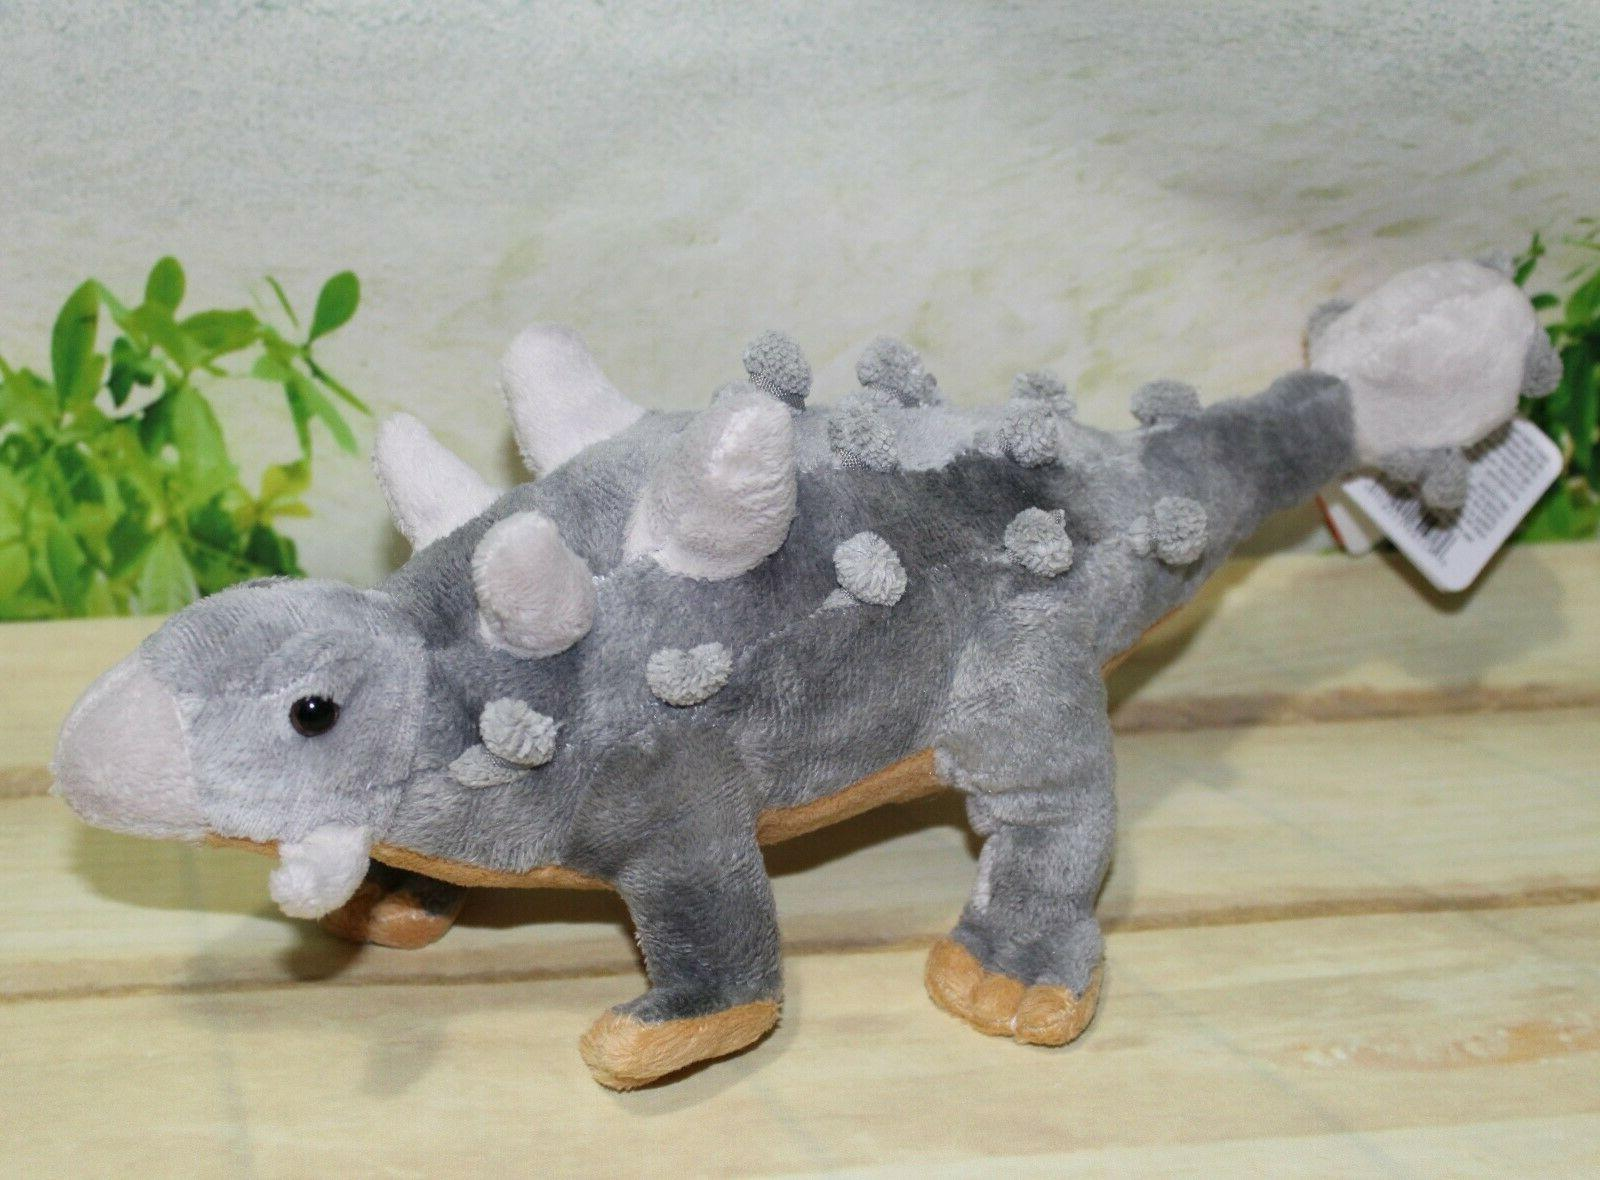 dinosauria mini ankylosaur plush